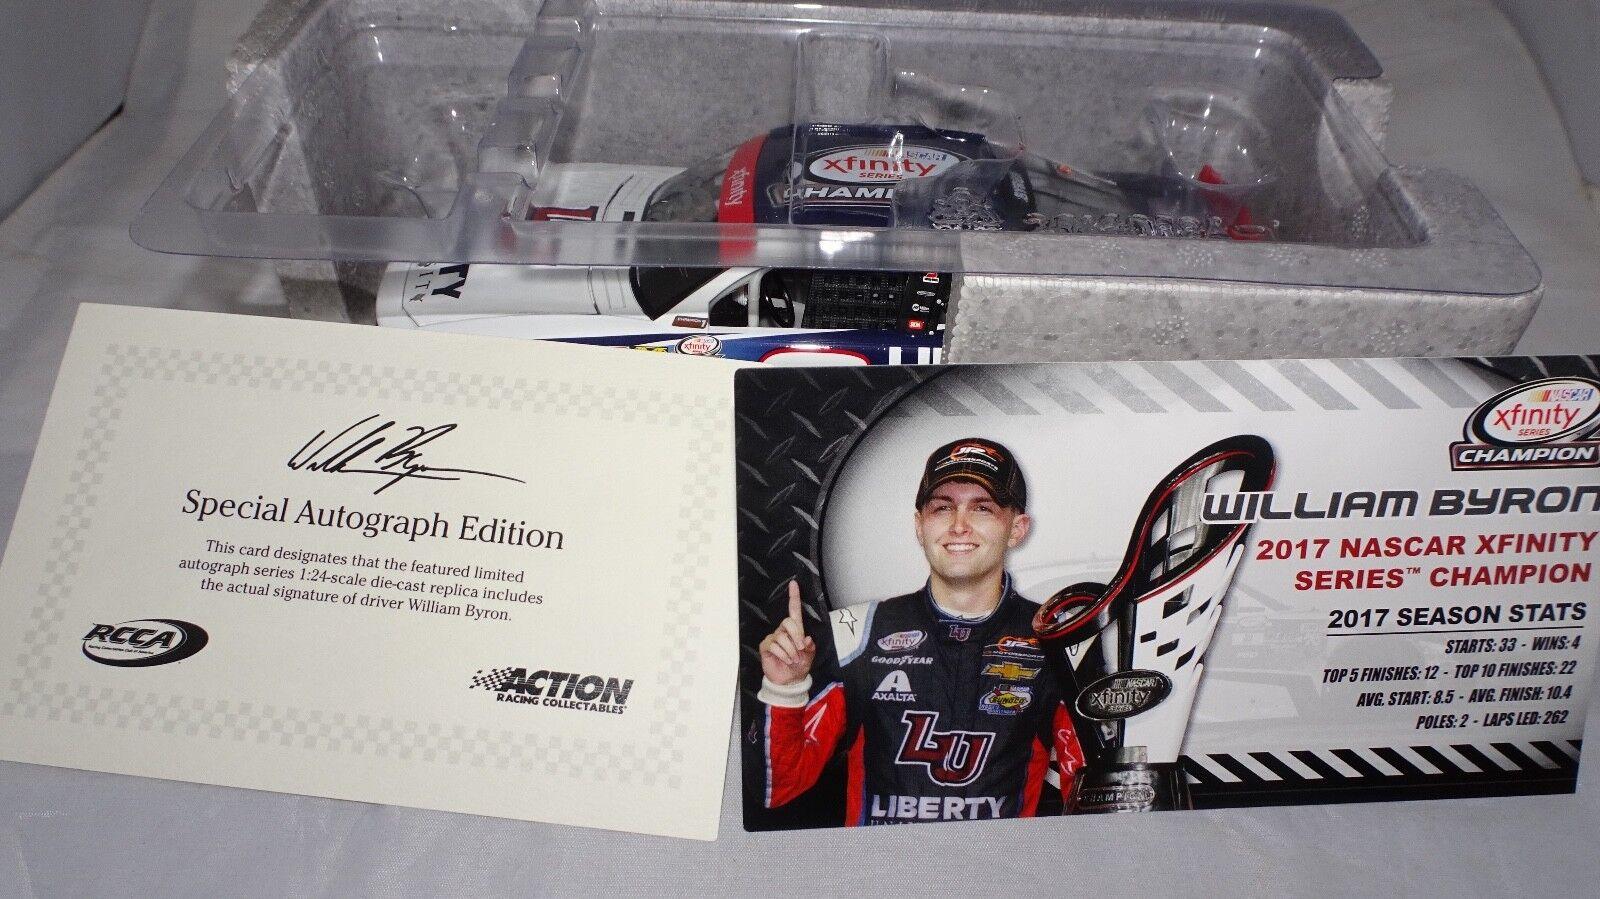 NASCAR William Byron 9 Liberty University Champion 2017 dédicacé 1 24